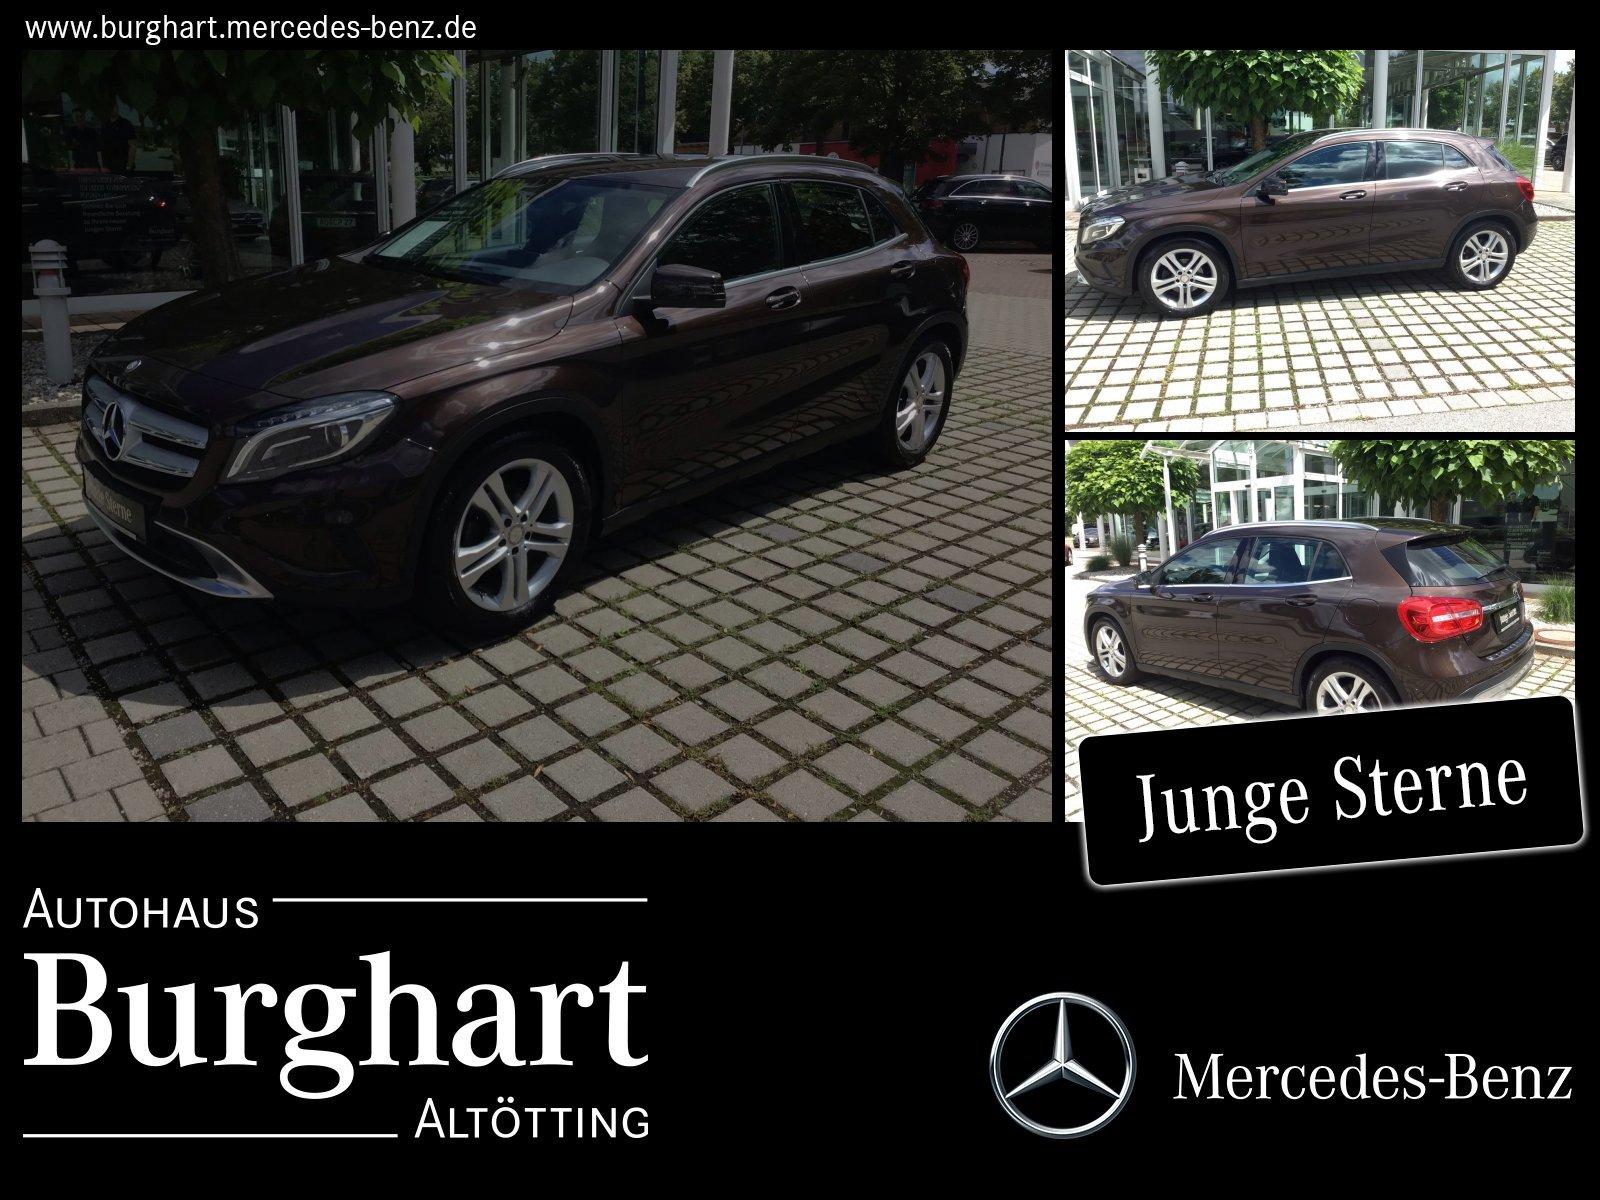 Mercedes-Benz GLA 200 Urban/Business/AHK/Navi/Xenon/ParkAssist, Jahr 2016, Benzin